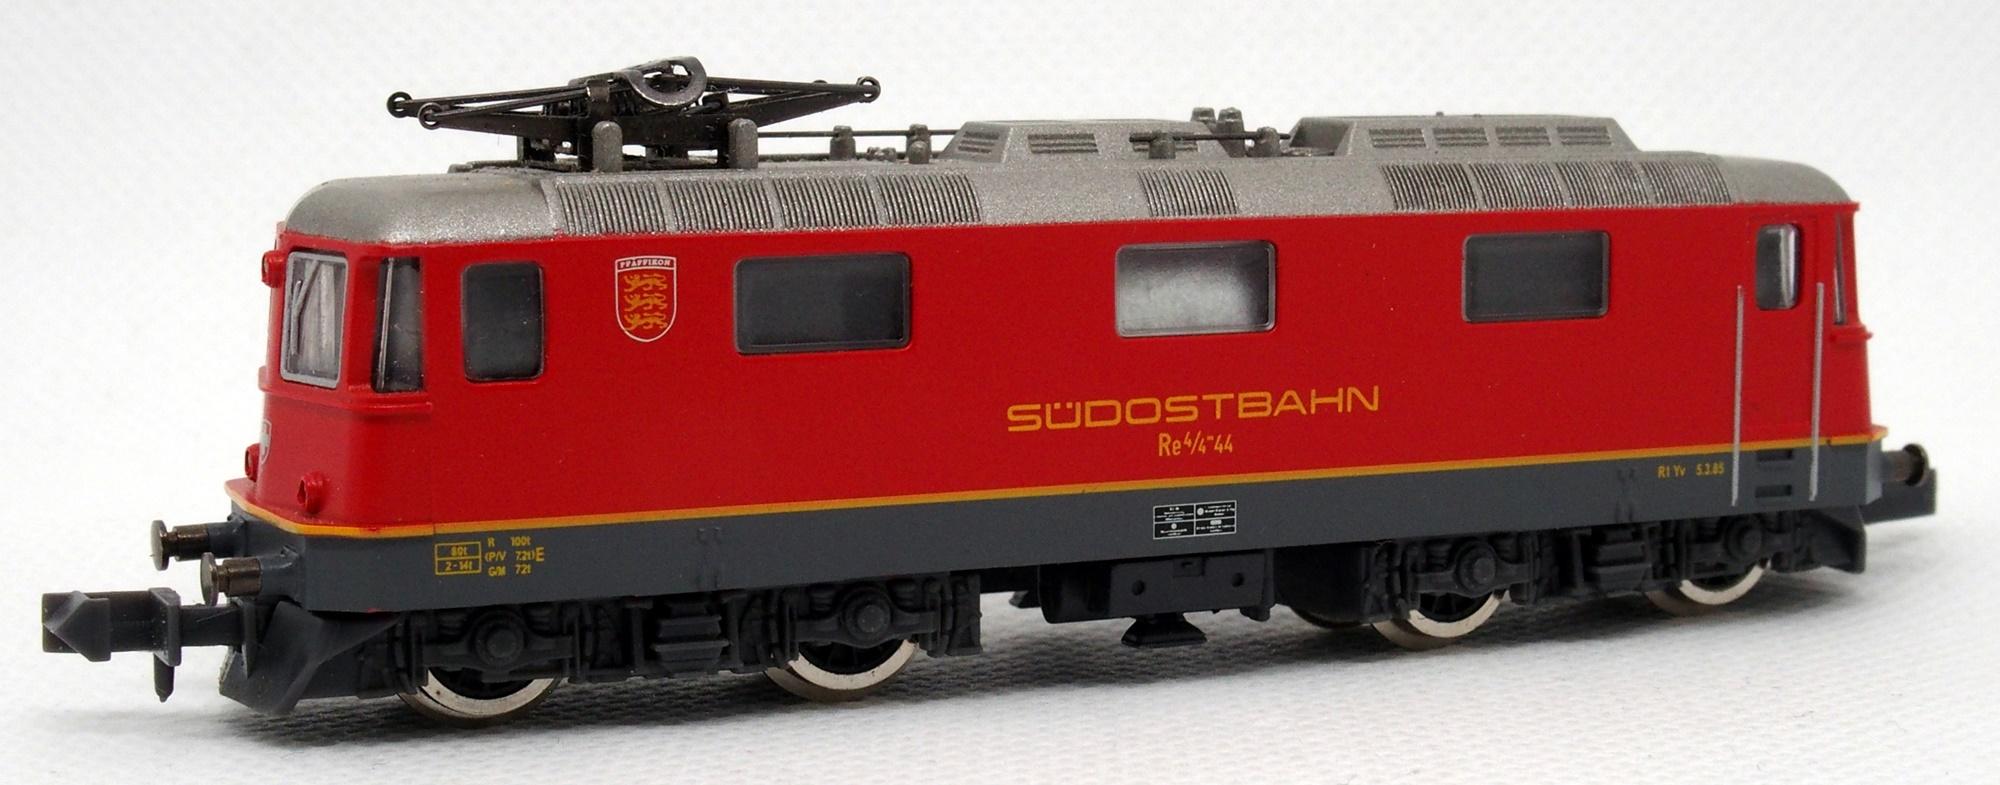 N Scale - De Agostini - Ferrovia del Gottardo-A - Locomotive, Electric, Re 4/4 II - Südostbahn - 44